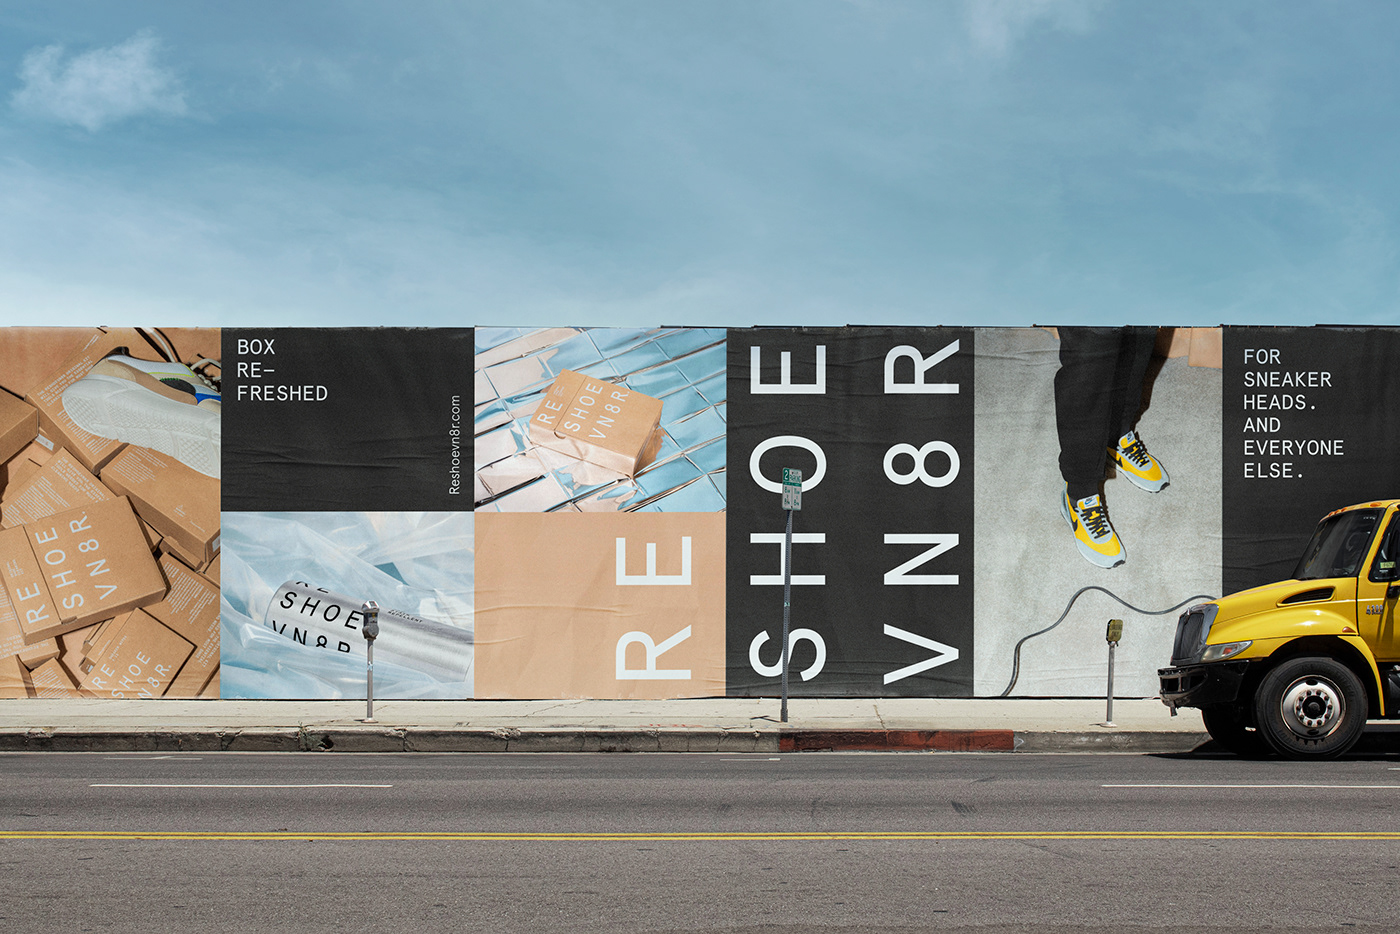 Reshoevn8r bill board paste up LA, USA